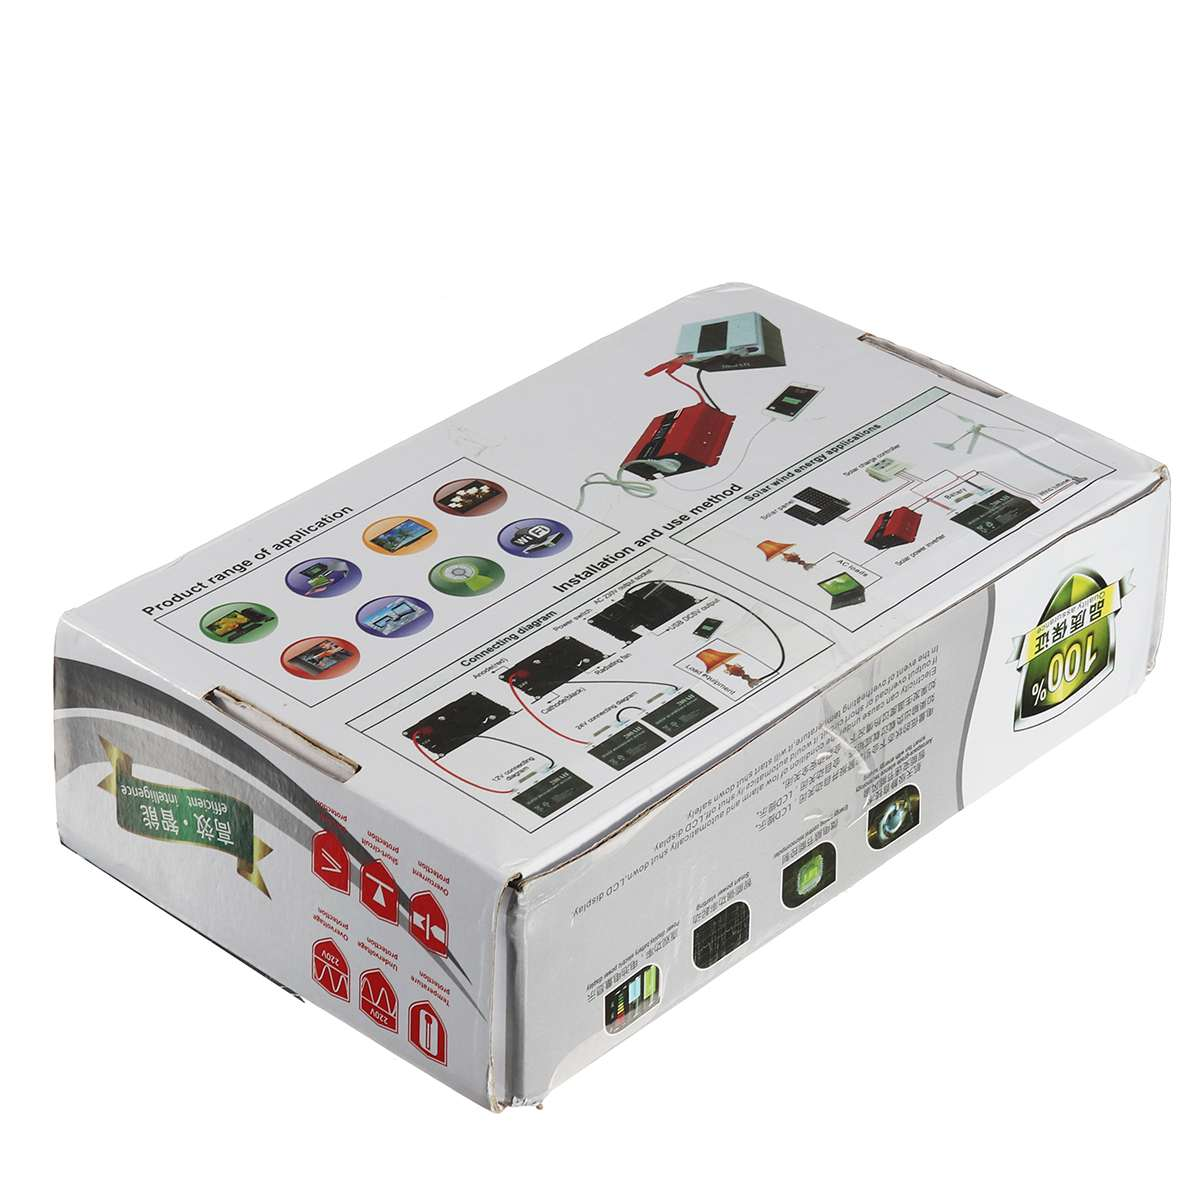 KROAK SDB-600A 3000 W Power Inverter LCD Display DC 12/24 V zu AC 110 V/220 V modifizierte Sinus Welle Konverter